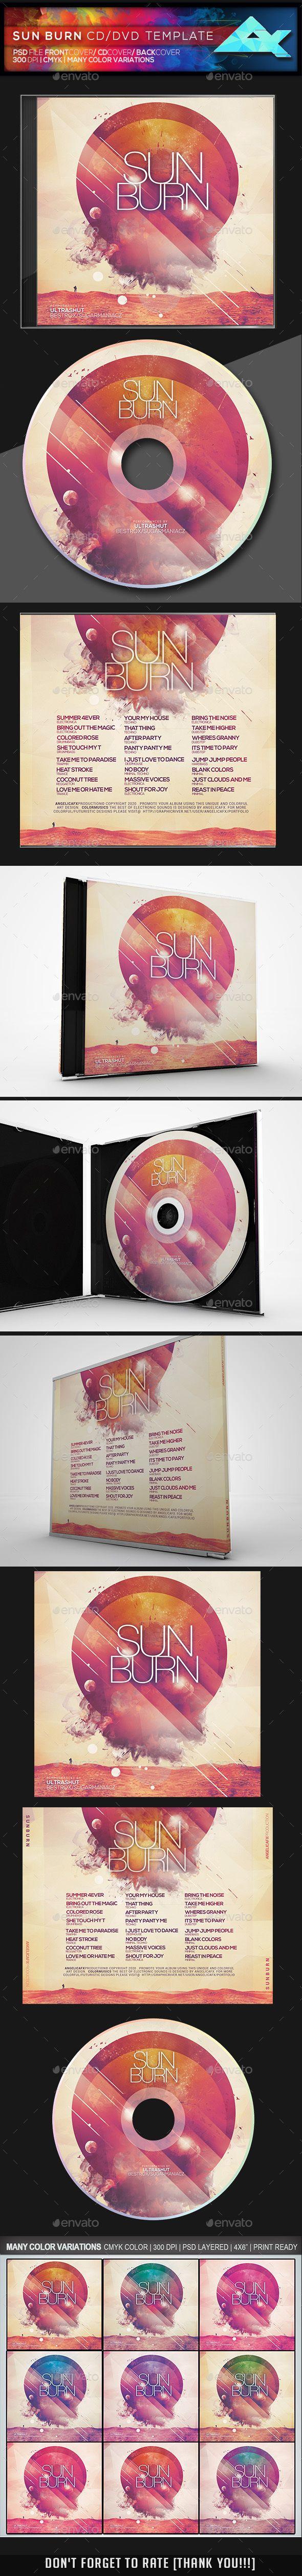 Sun Burn CD/DVD Template - #CD & DVD #Artwork Print Templates Download here: https://graphicriver.net/item/sun-burn-cddvd-template/19554397?ref=alena994